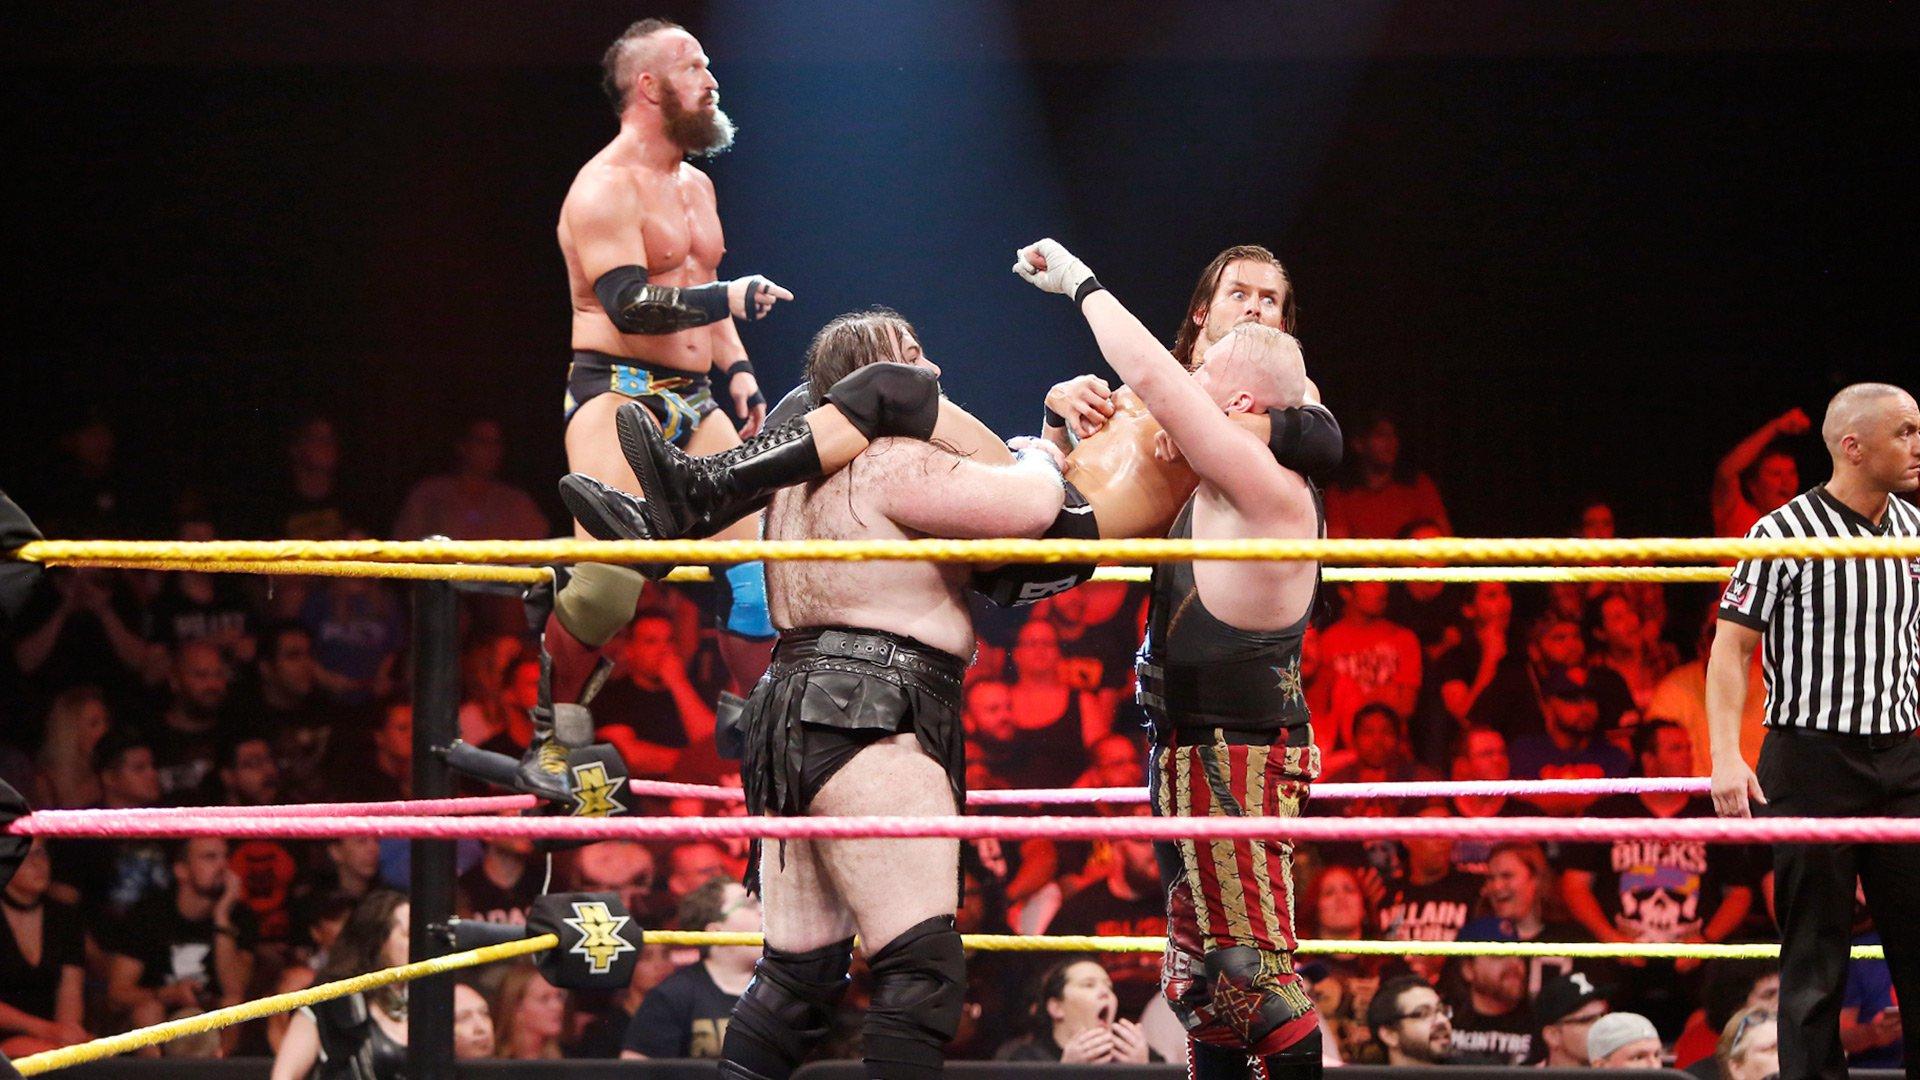 SAnitY vs. The Undisputed ERA: WWE NXT, Oct. 18, 2017